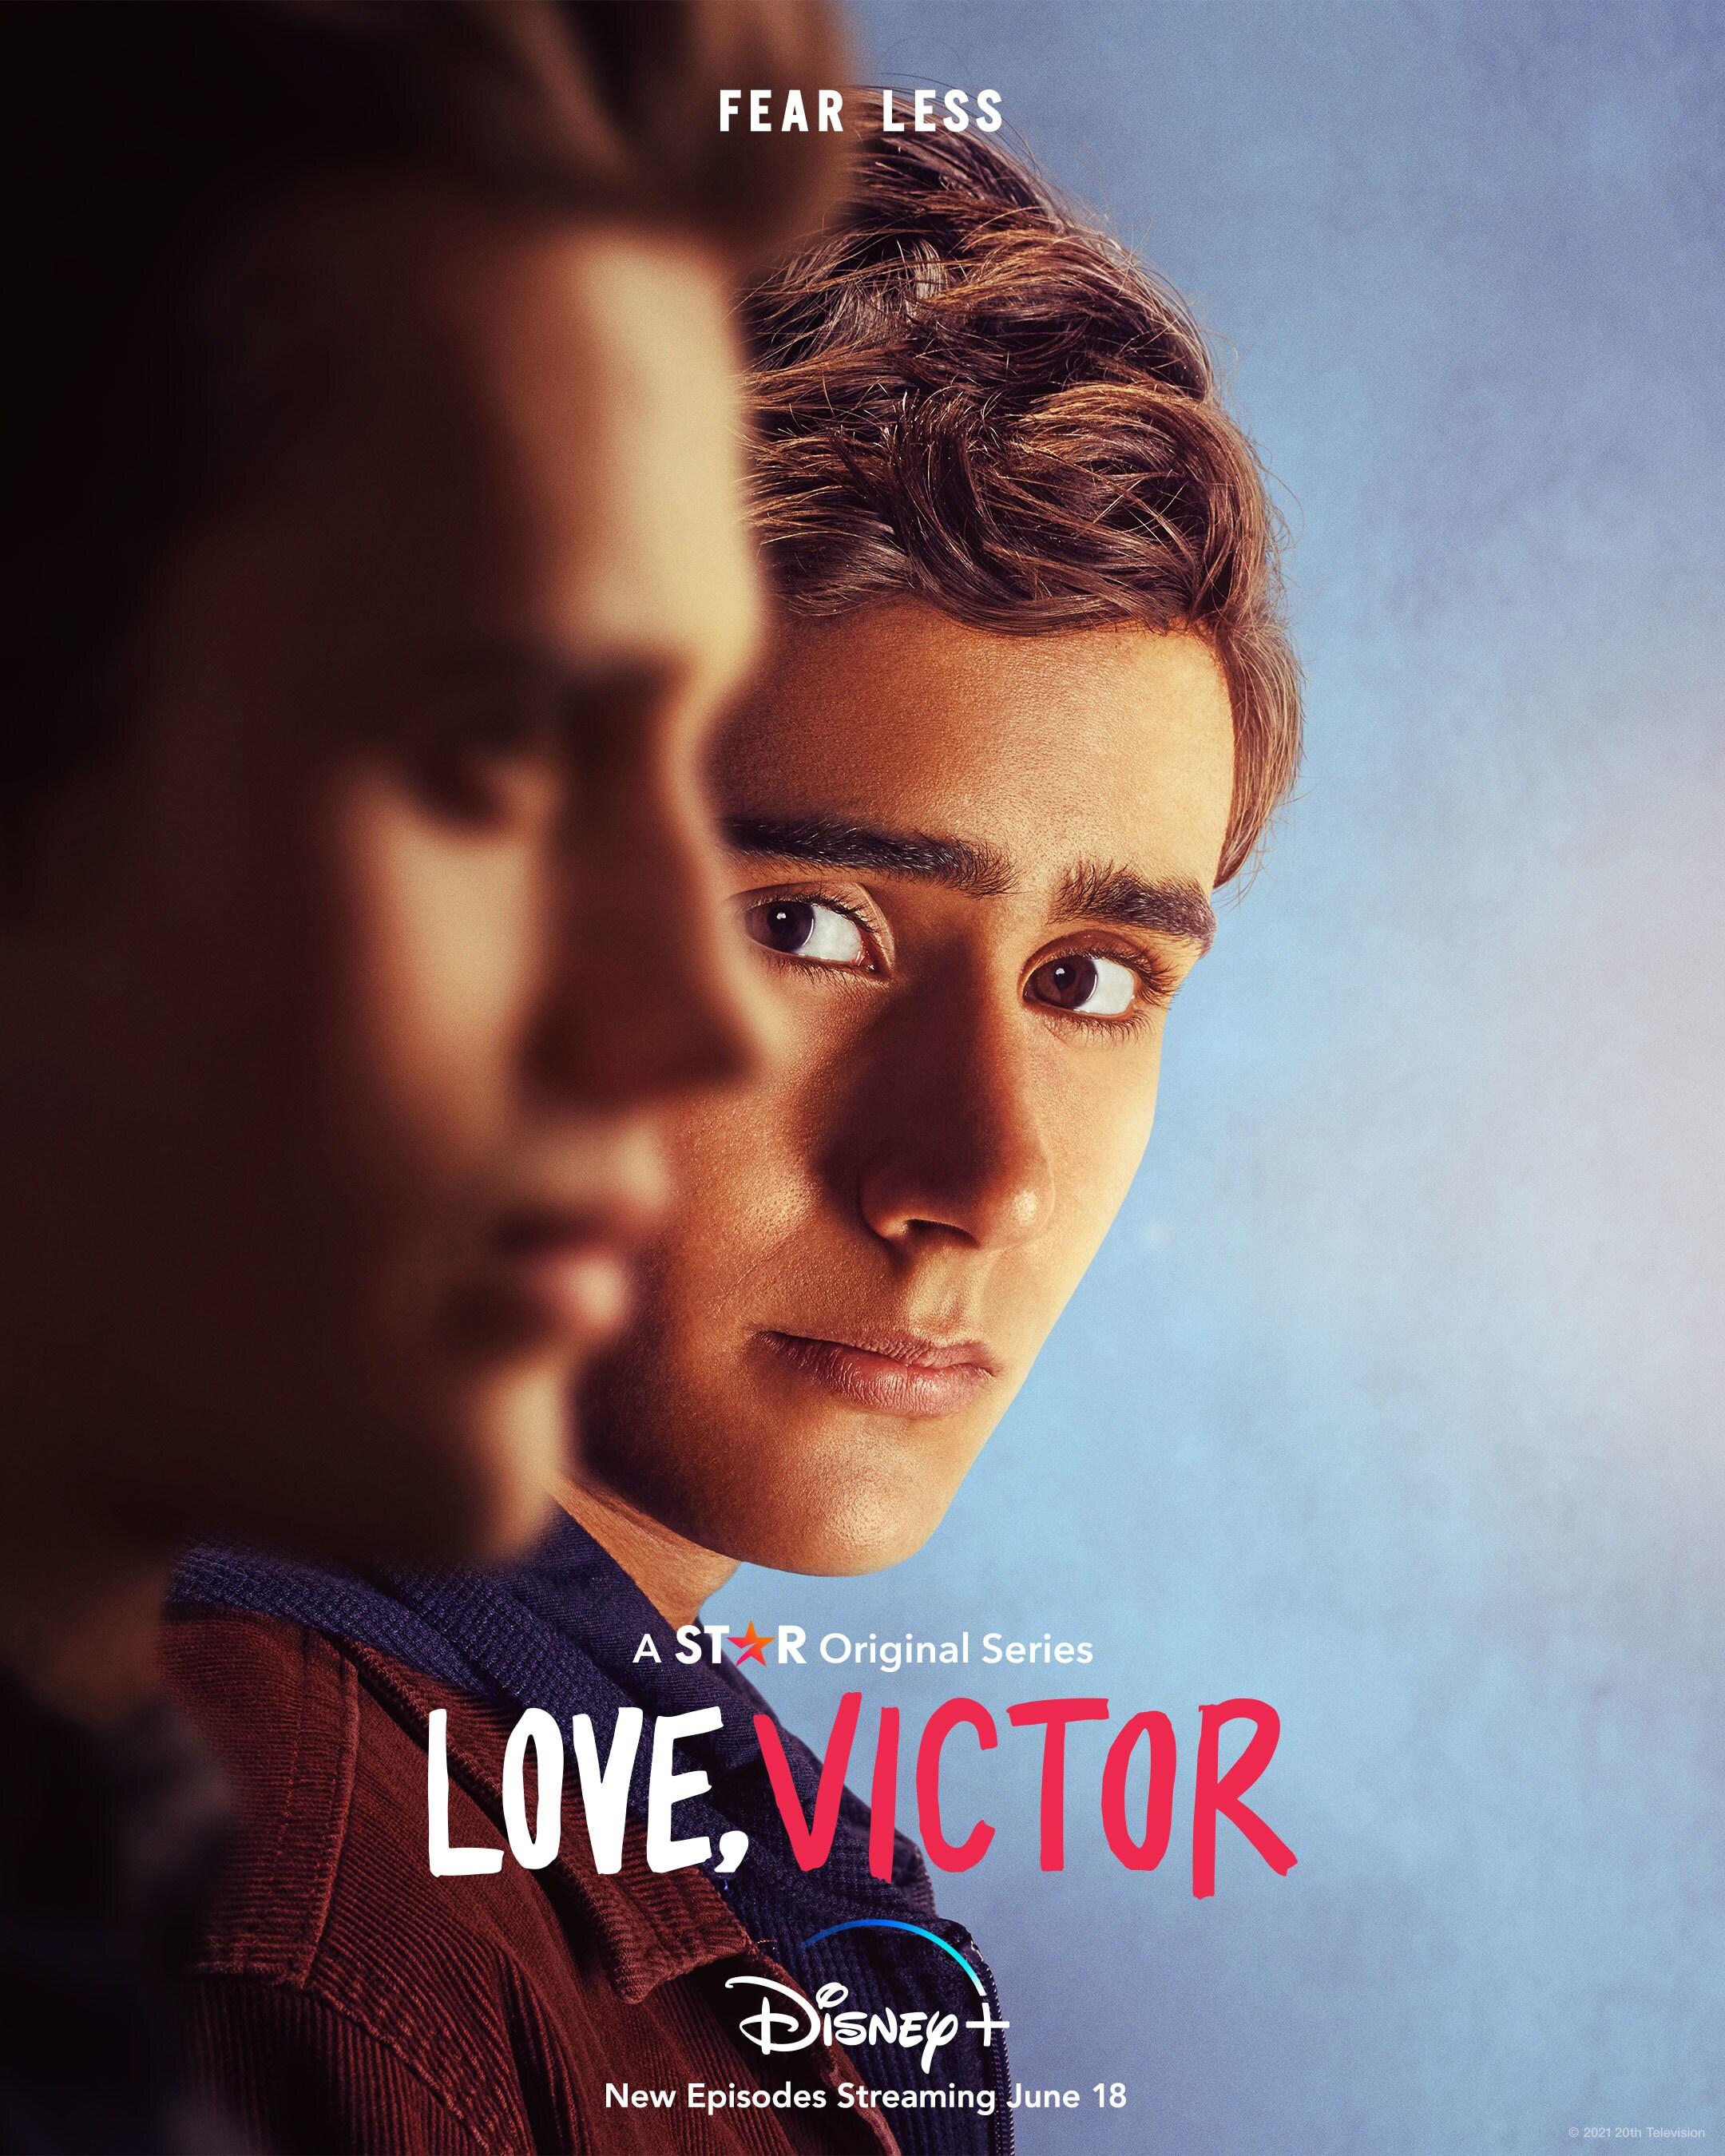 Love victor s2 key art